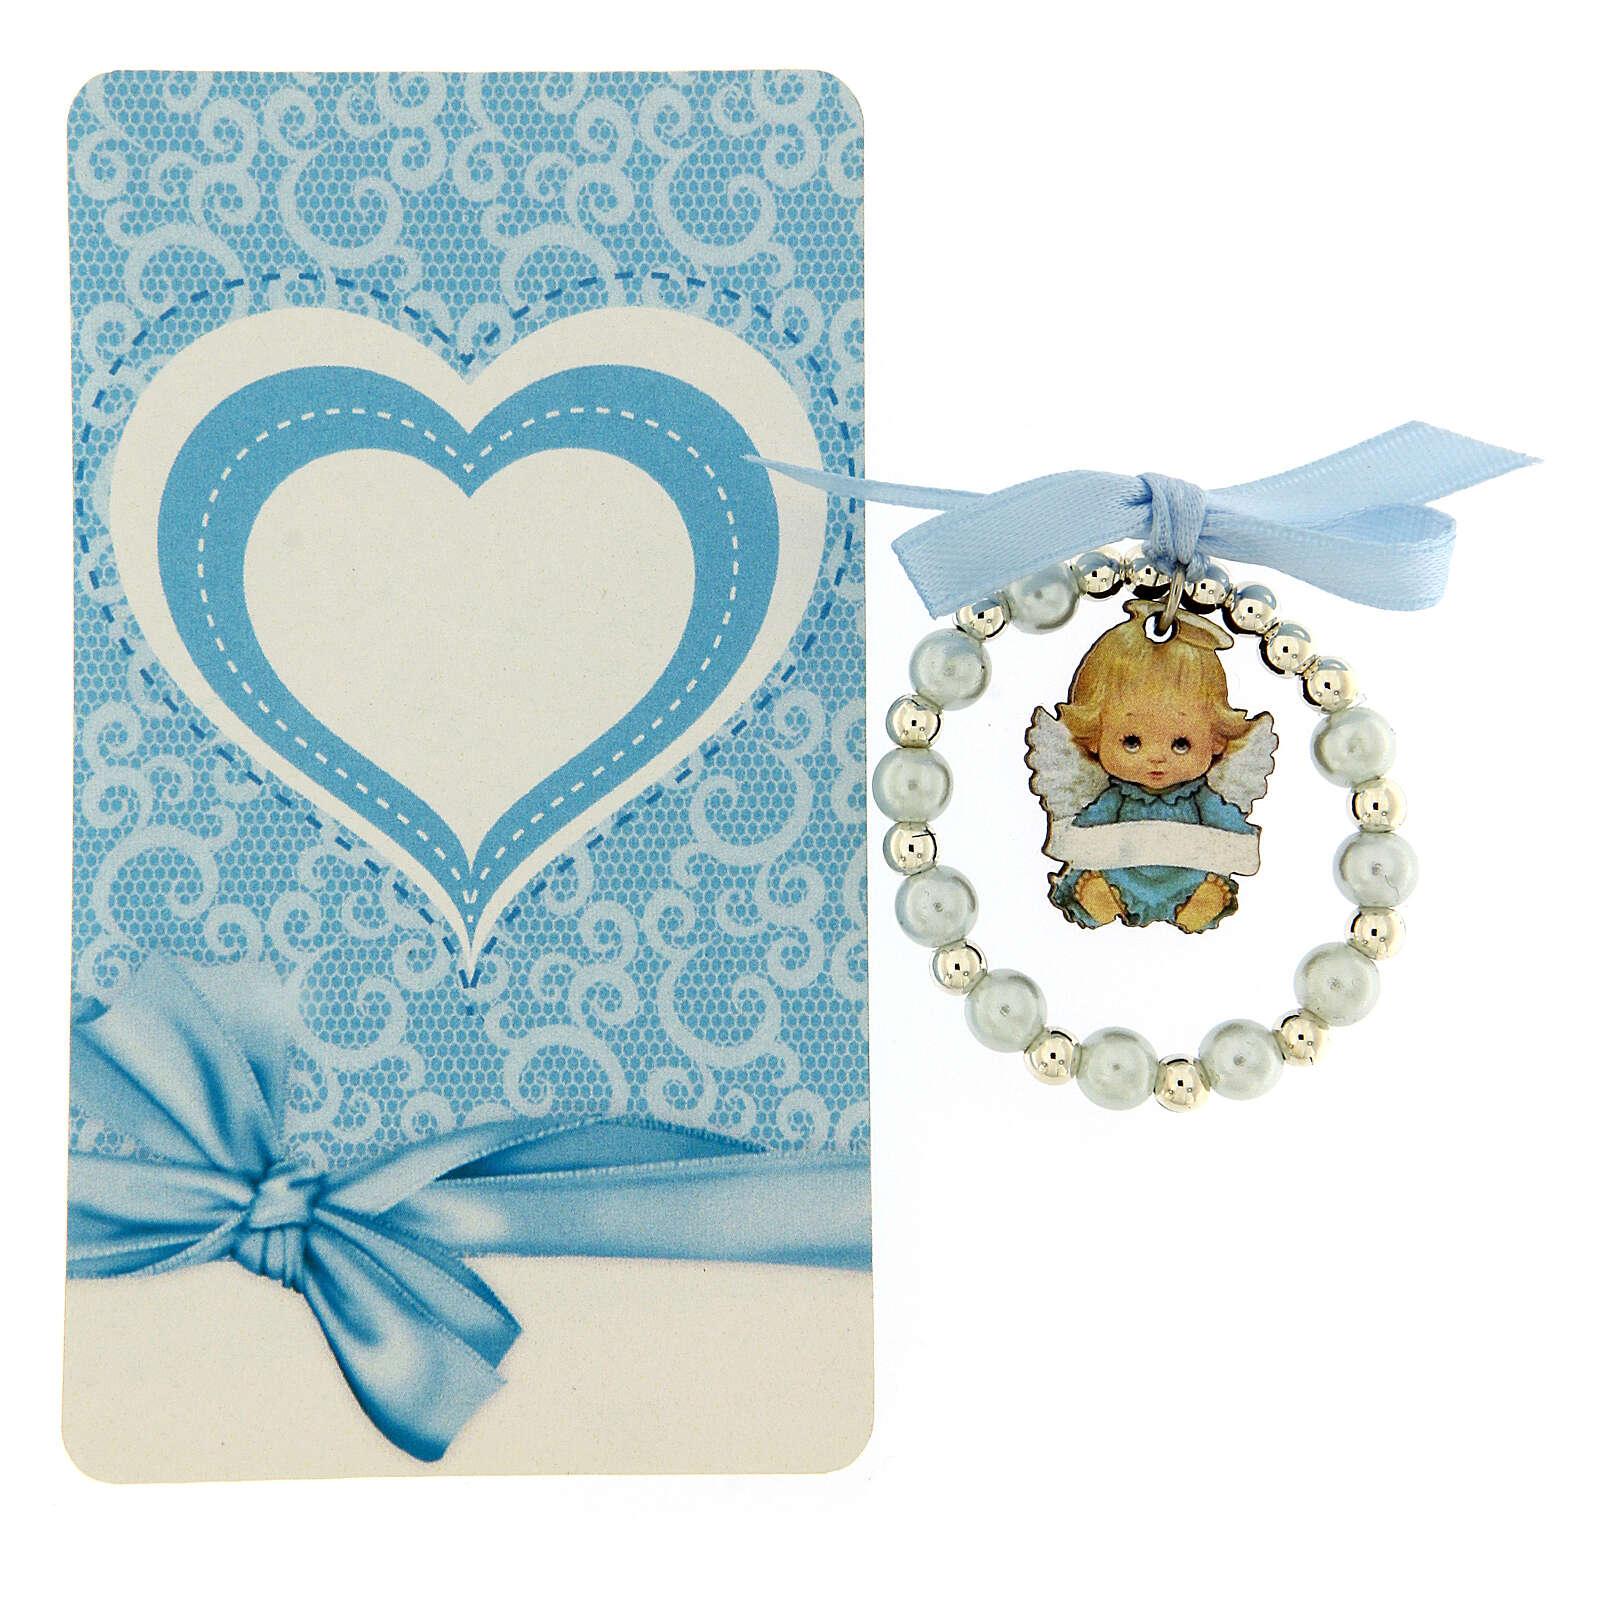 Pulsera angelito madera decena vidrio perlado moño azul 4